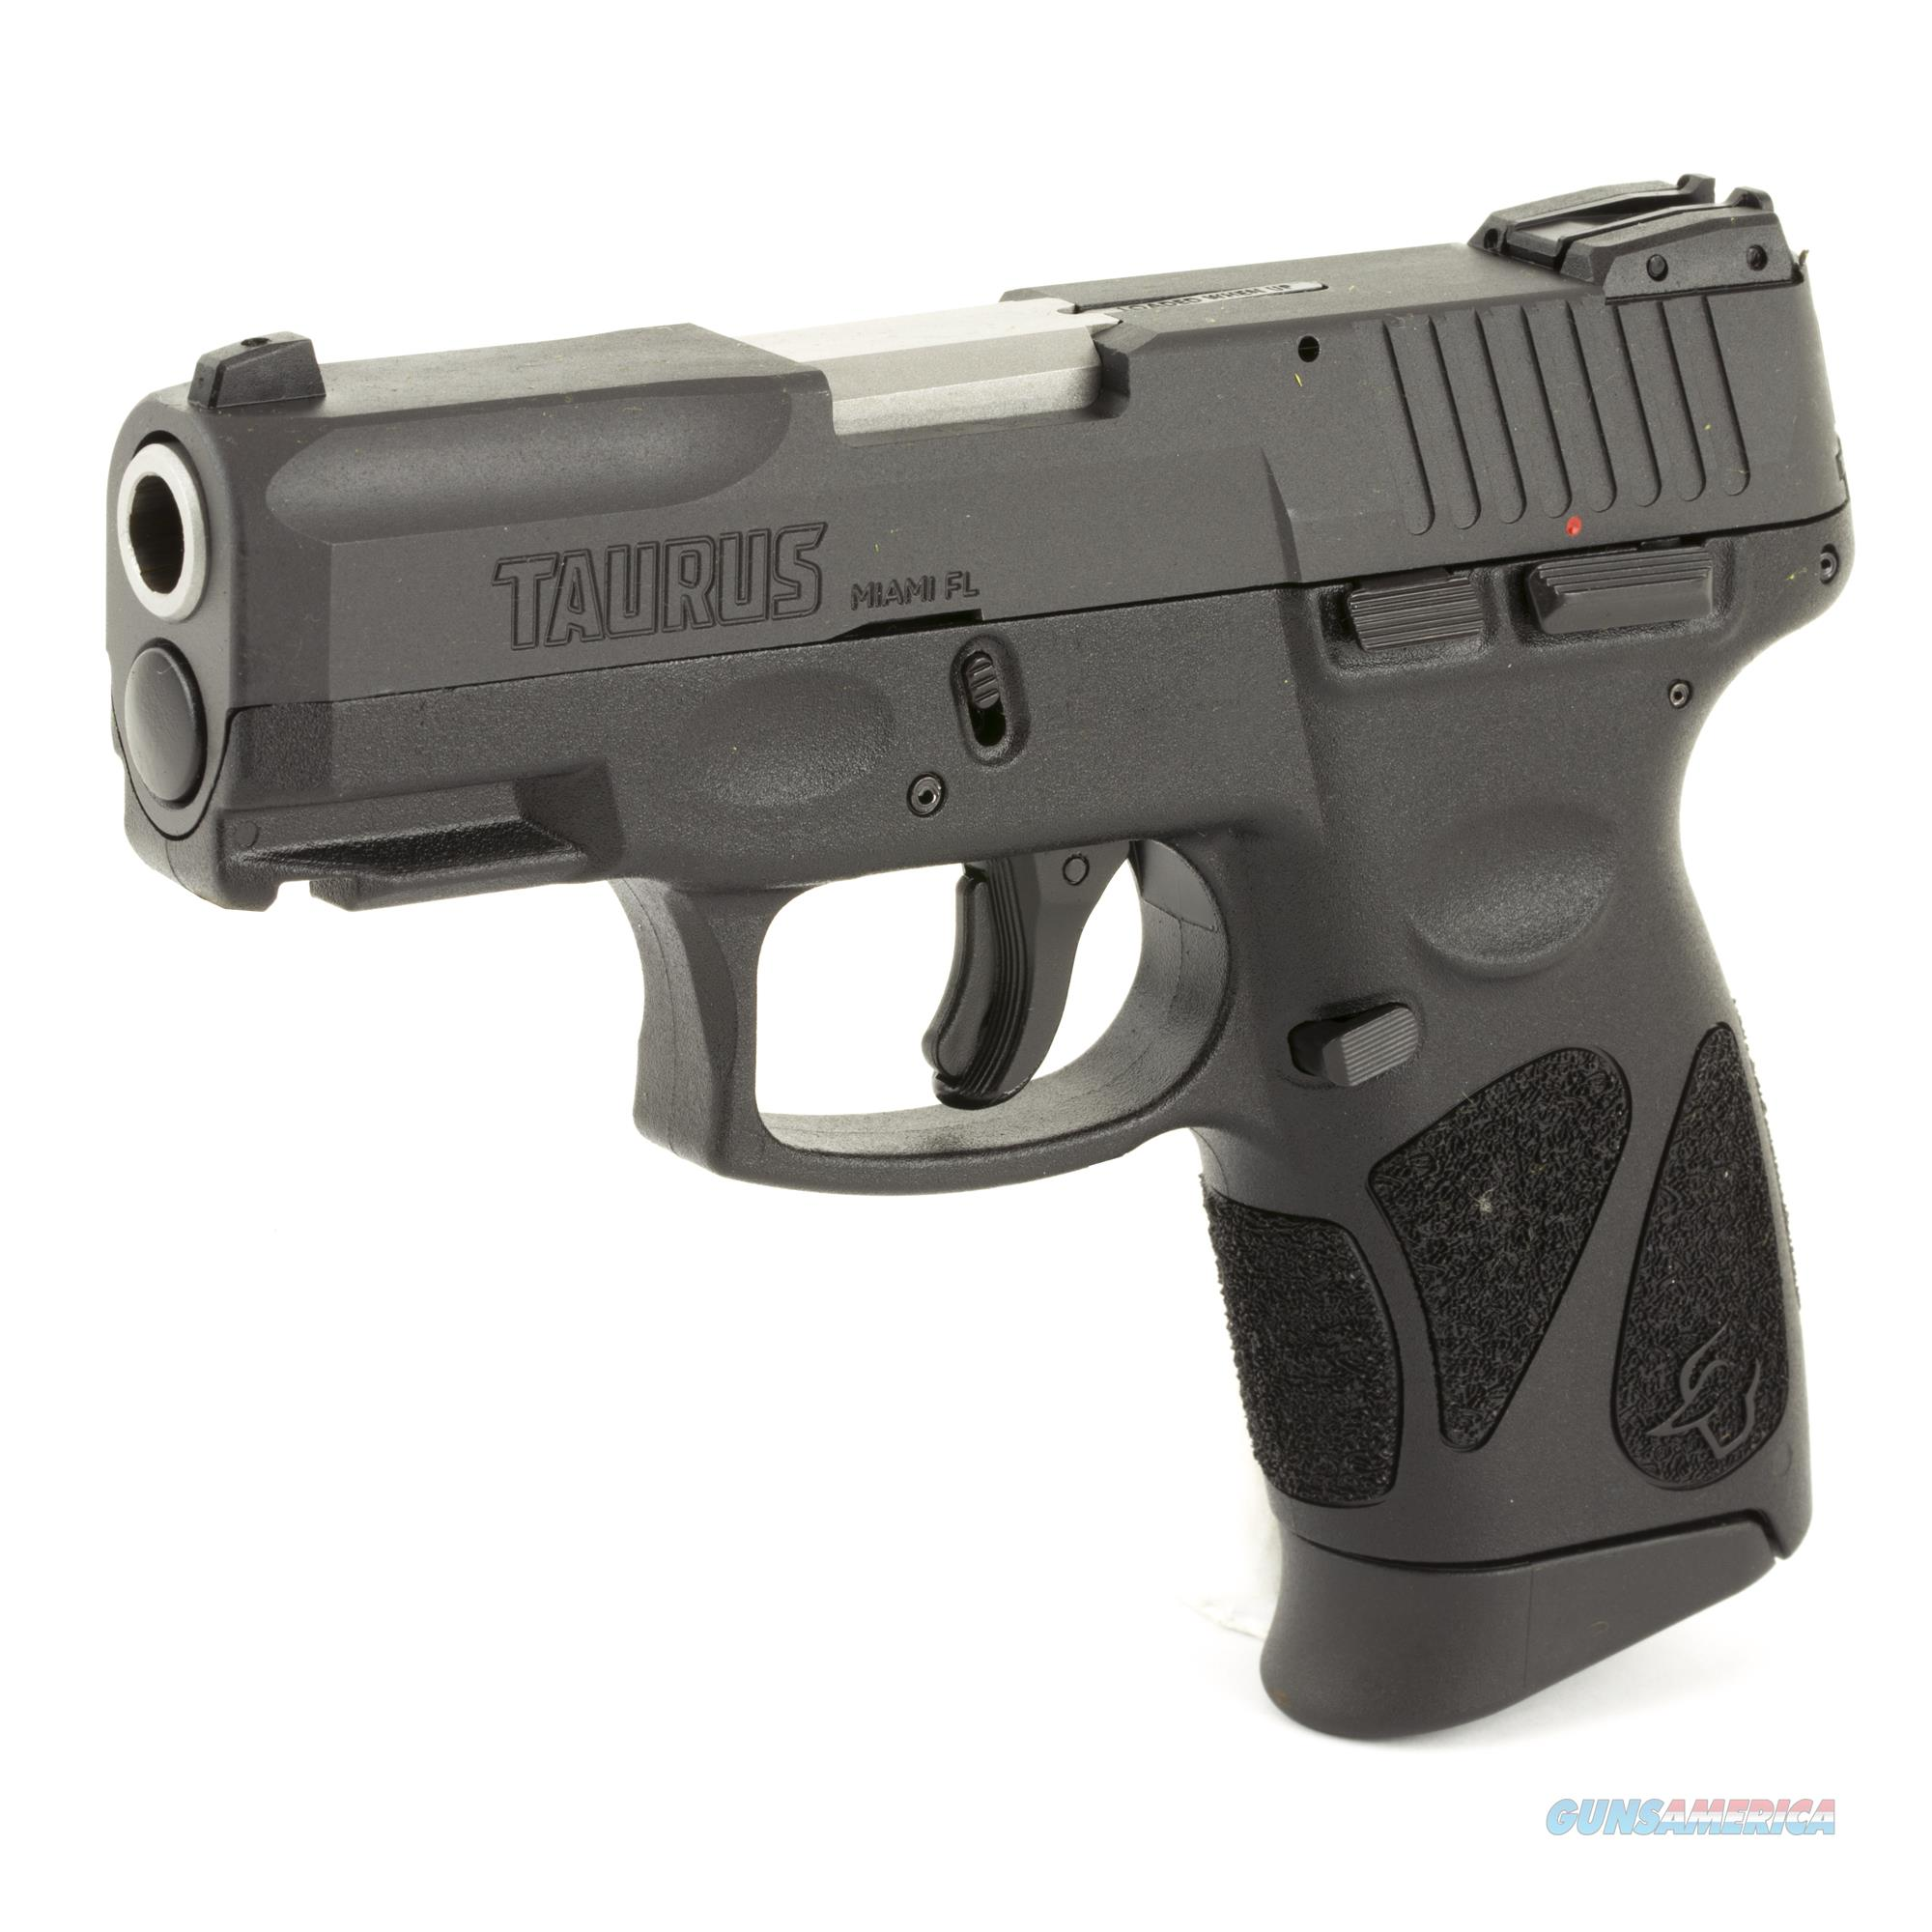 TAURUS G2C 2MAGS 12RND  Guns > Pistols > Taurus Pistols > Semi Auto Pistols > Polymer Frame